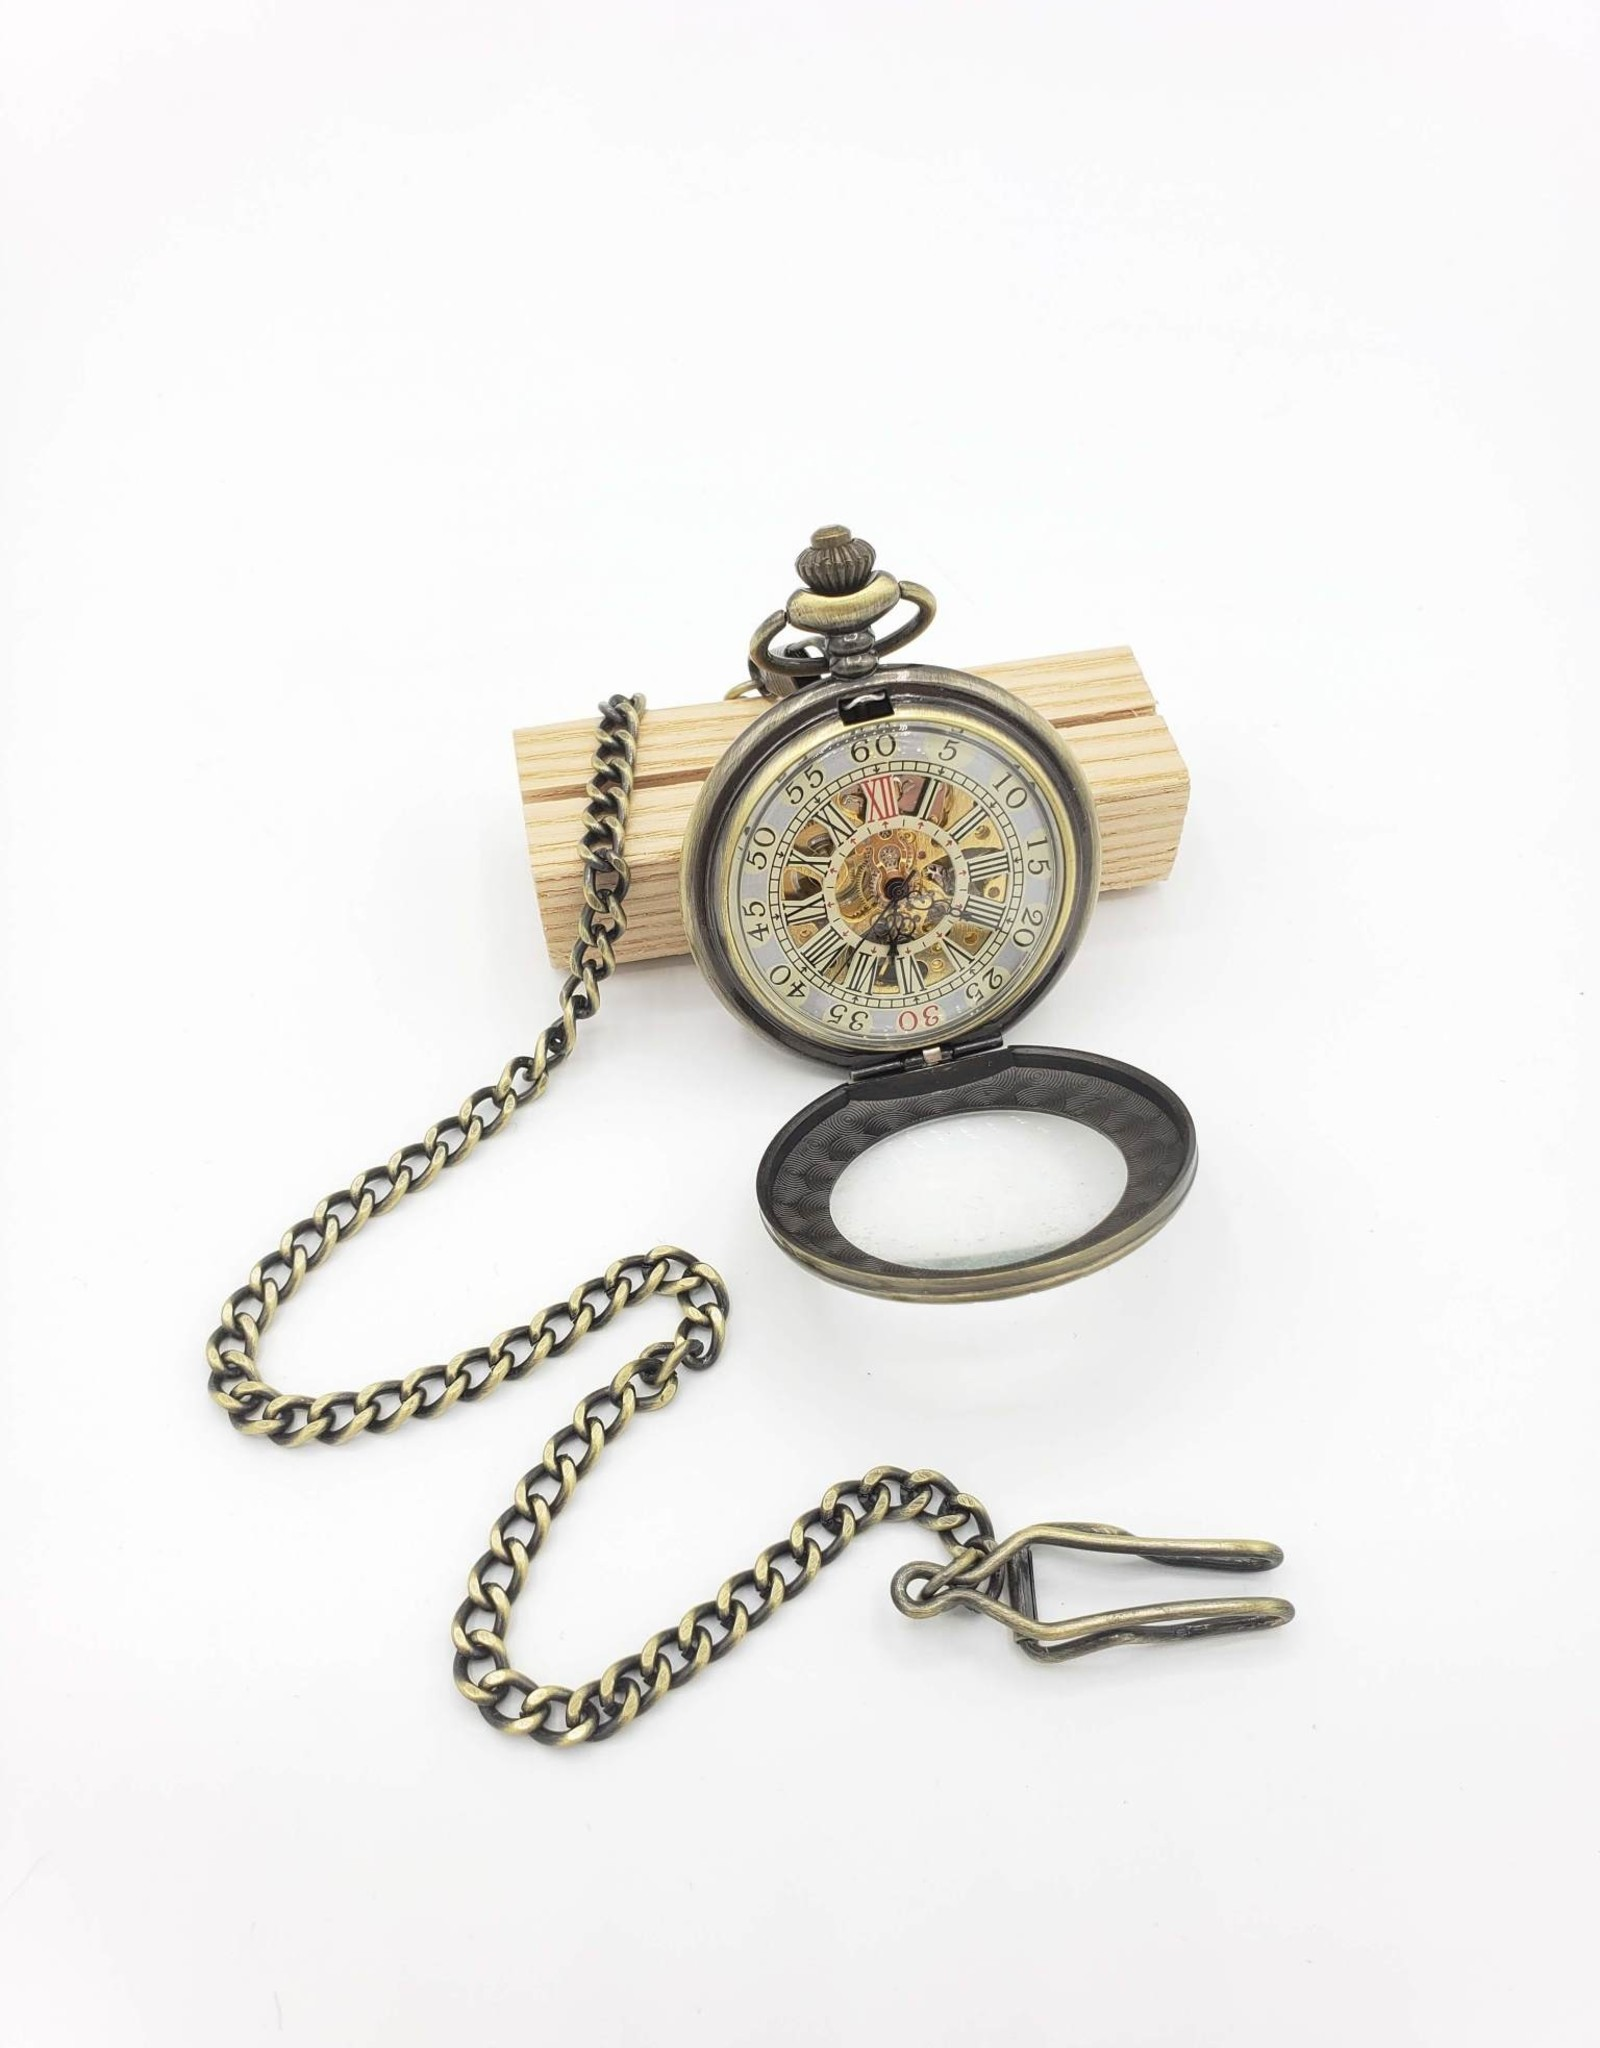 IGNY Vintage Style 1 Mechanical Pocket Watch - Large